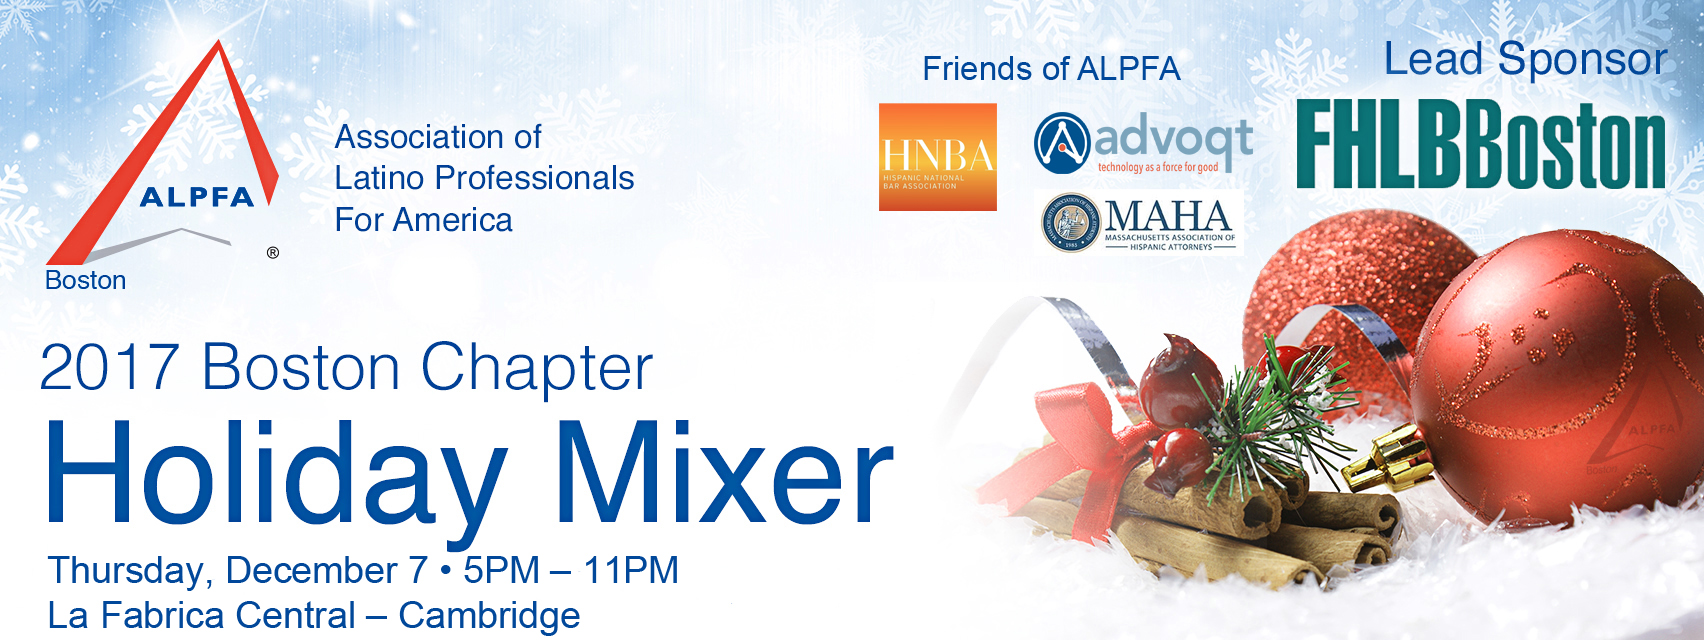 alpfaorg association of latino professionals for america 2017 holiday mixer banner ed boston application development job description alpfa - Application Development Job Description